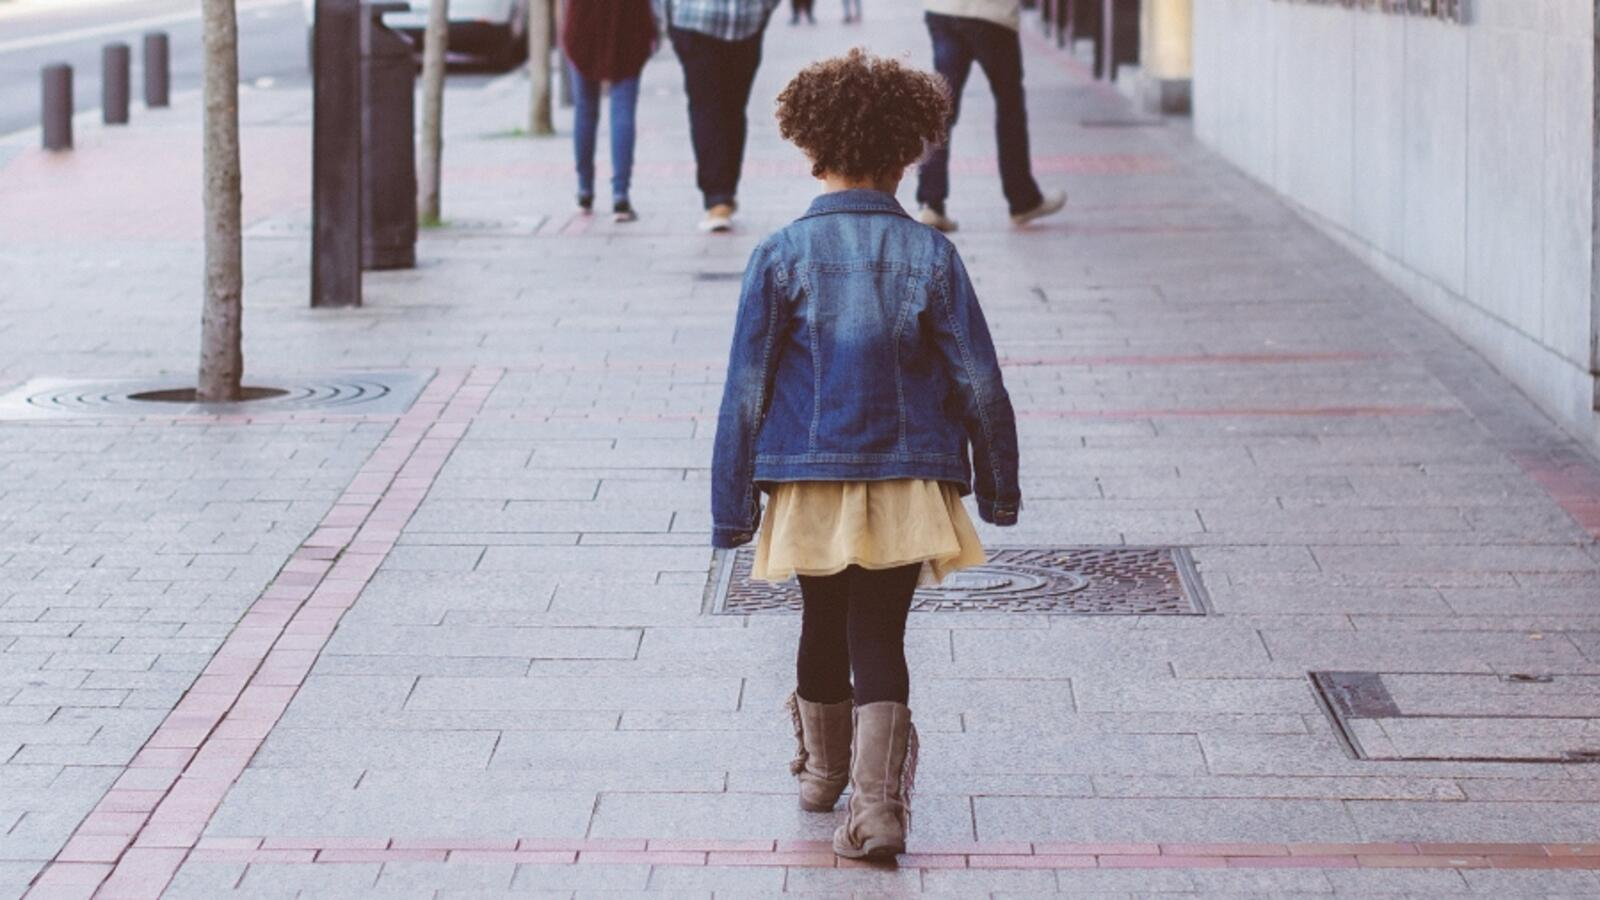 Twitter Addresses Disparity In News Coverage When Black Girls Go Missing